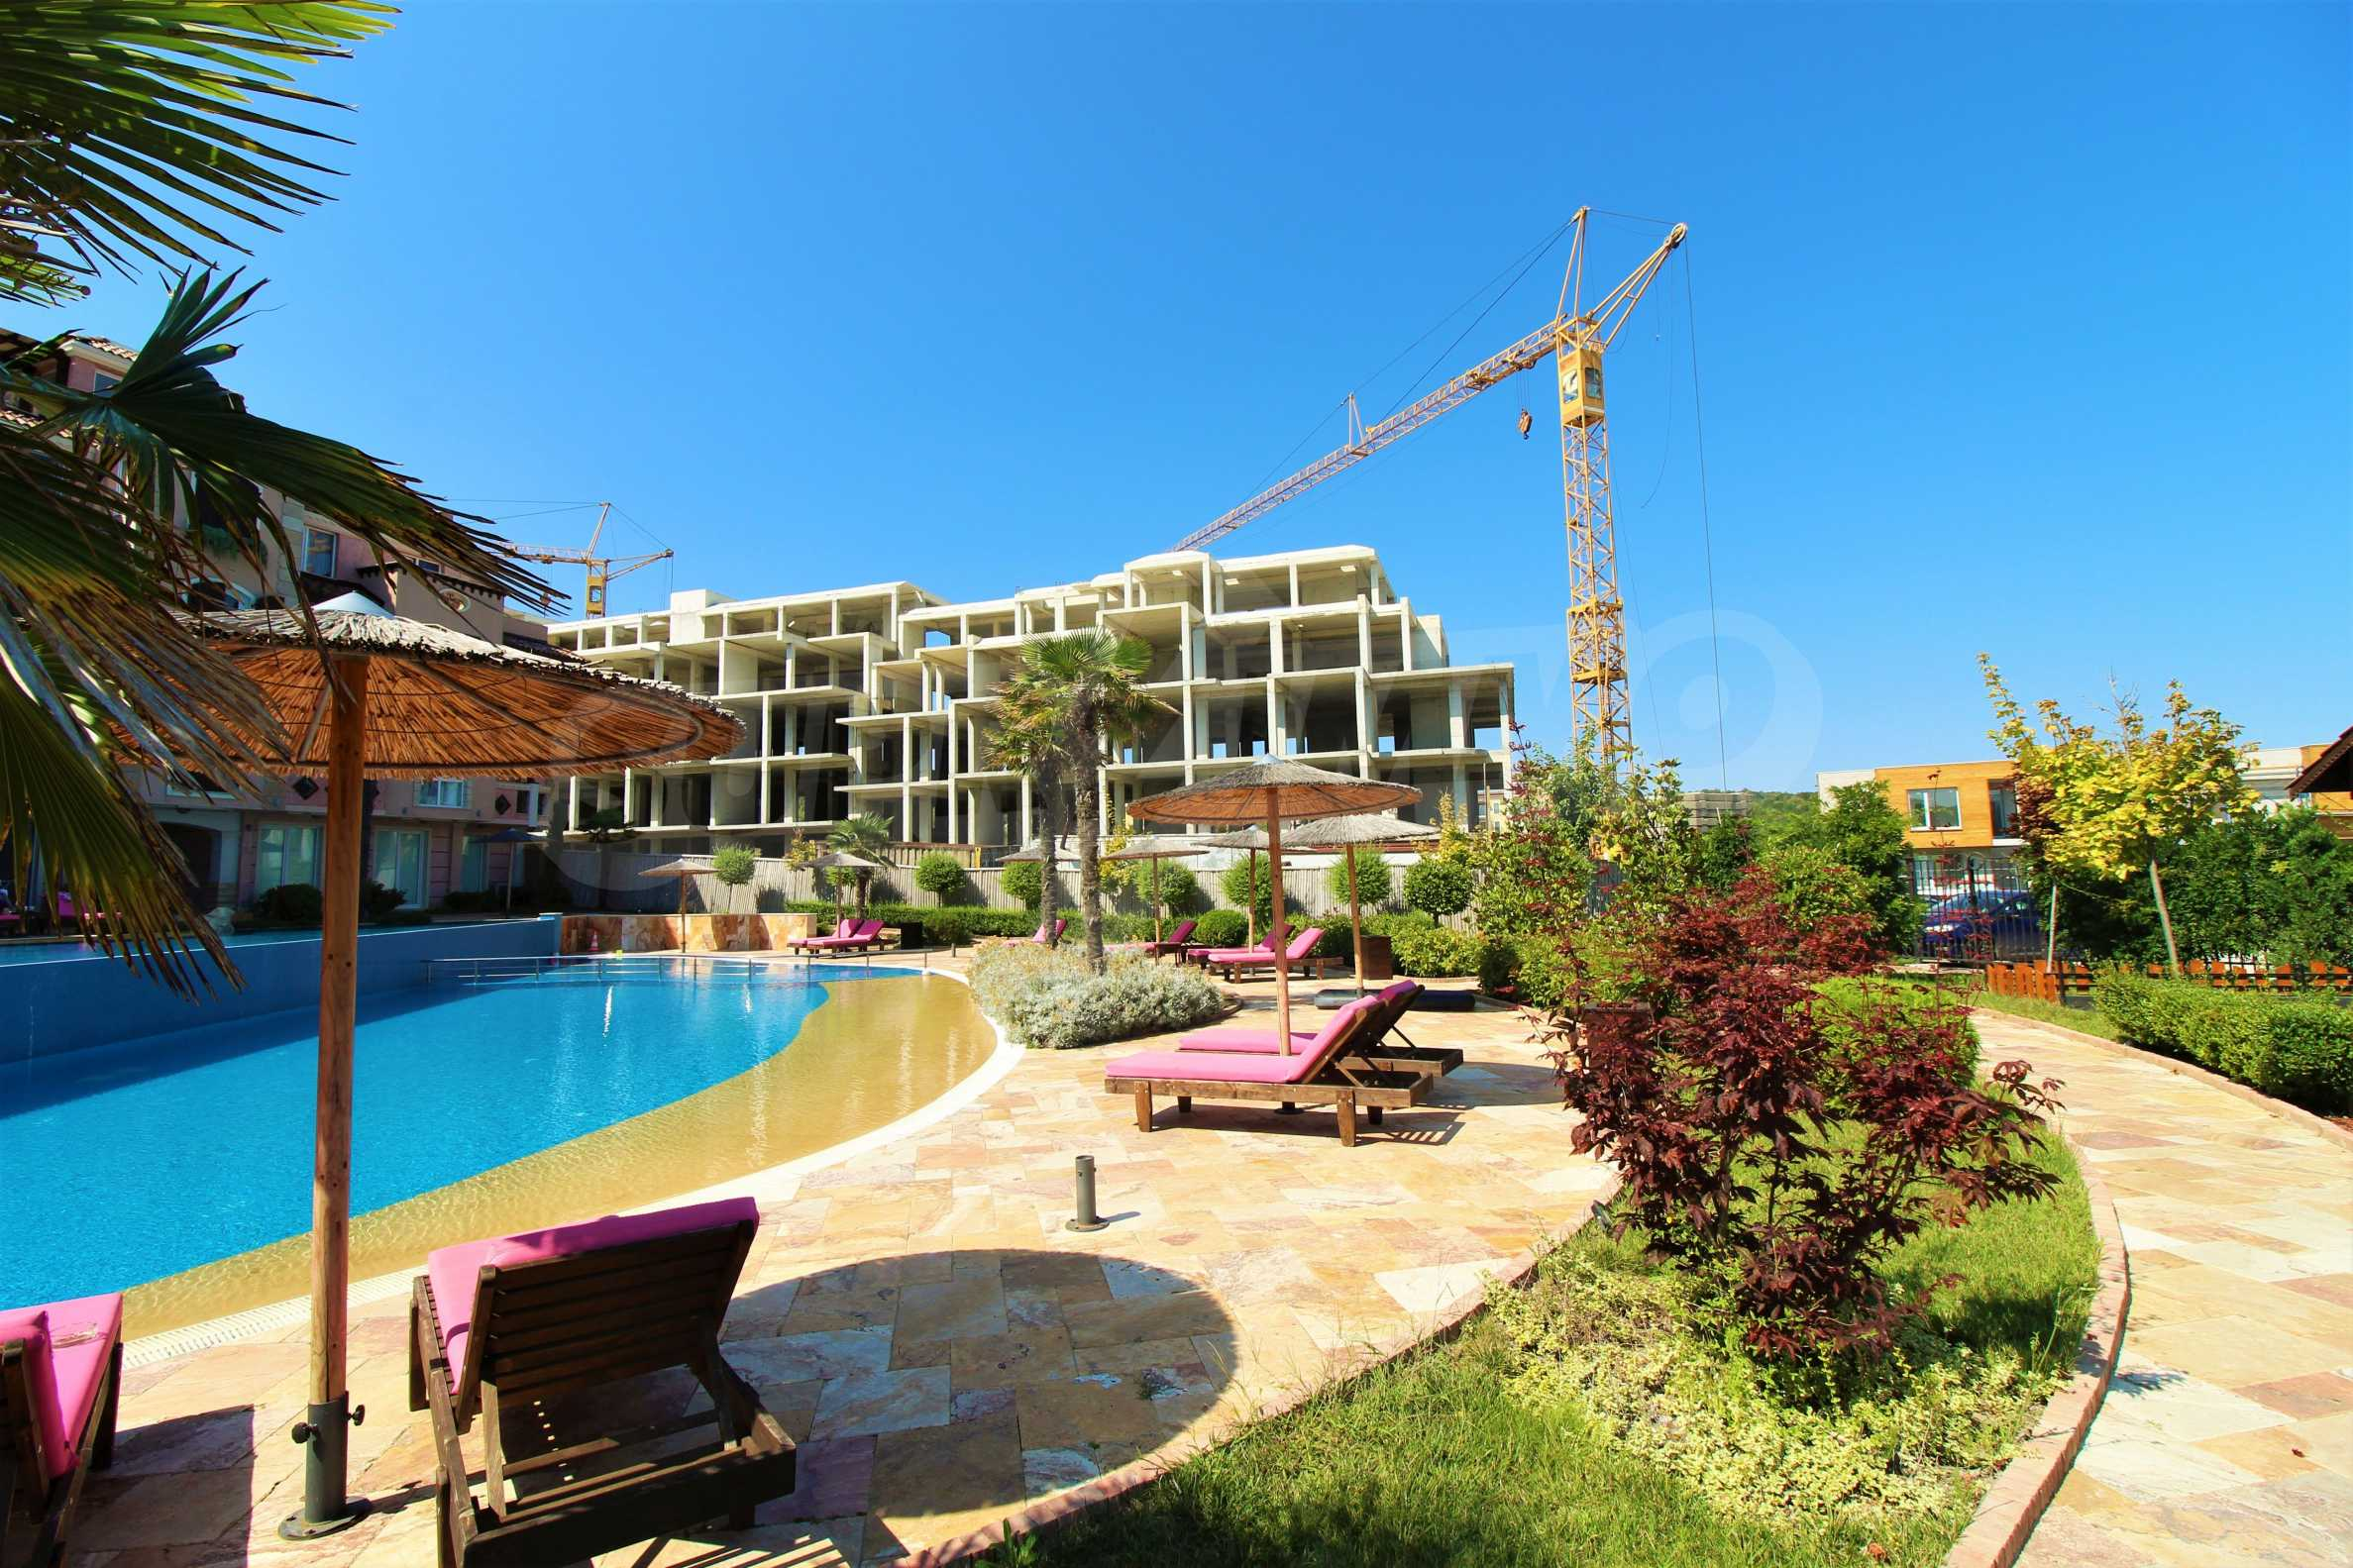 New 1-bedroom apartment in a coastal complex by the Kavatsite Beach (Sozopol) 16